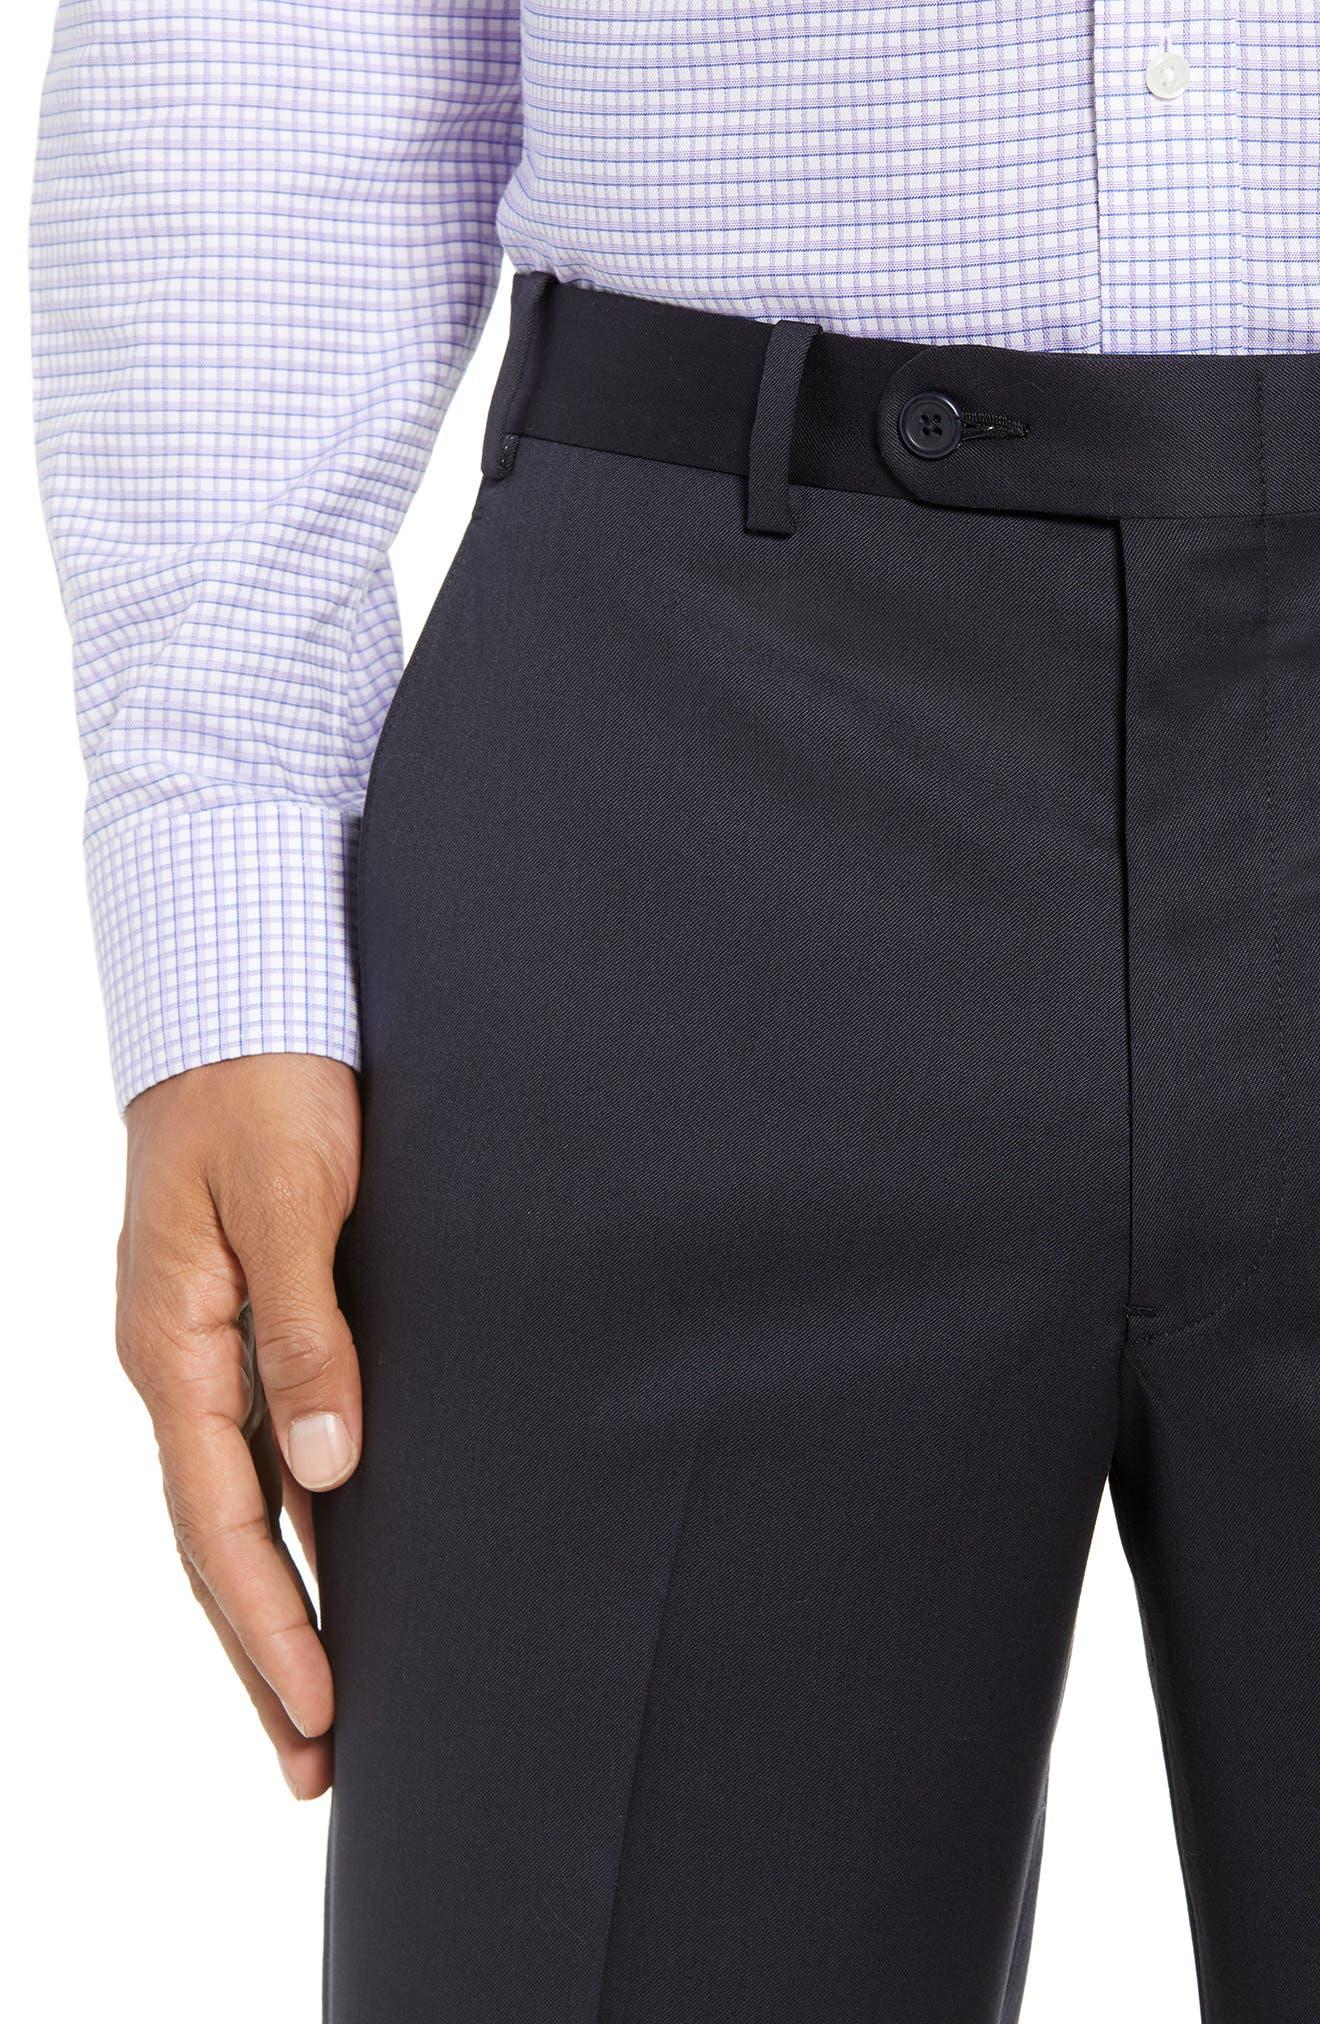 Torino Flat Front Wool Gabardine Trousers,                             Alternate thumbnail 23, color,